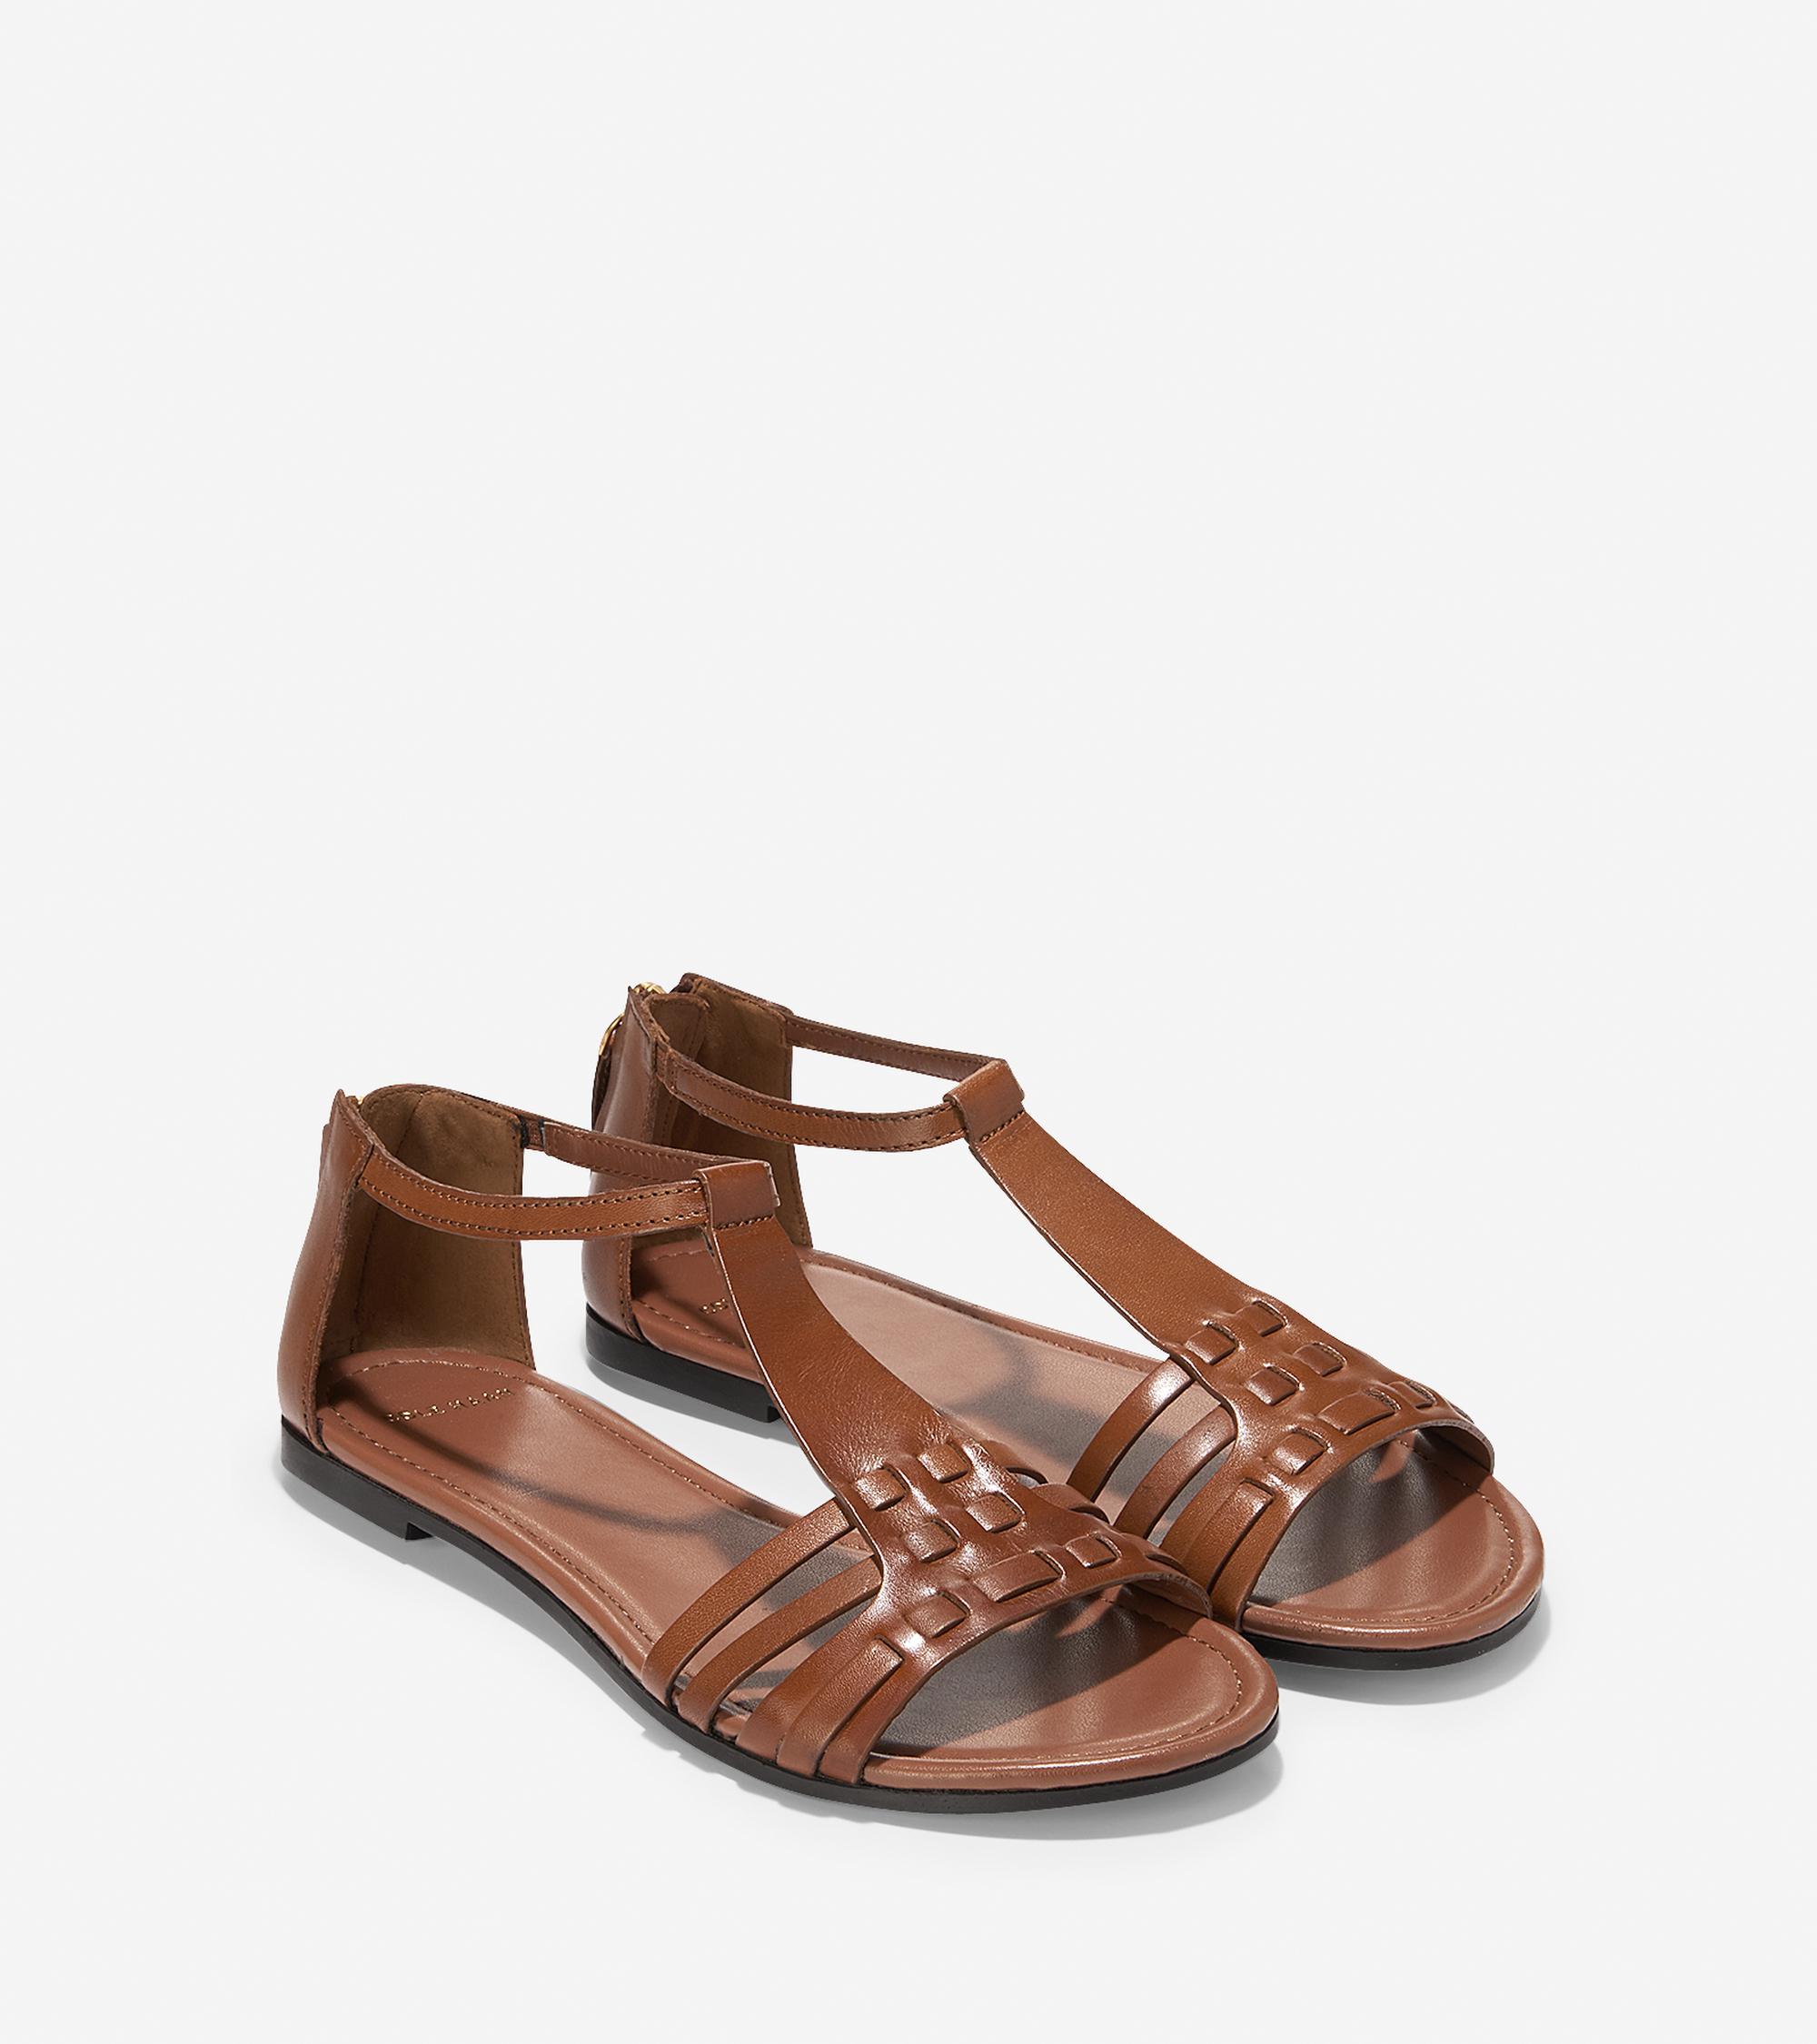 Original Cole Haan Cole Haan Jensen Flat Women Leather Brown Gladiator Sandal